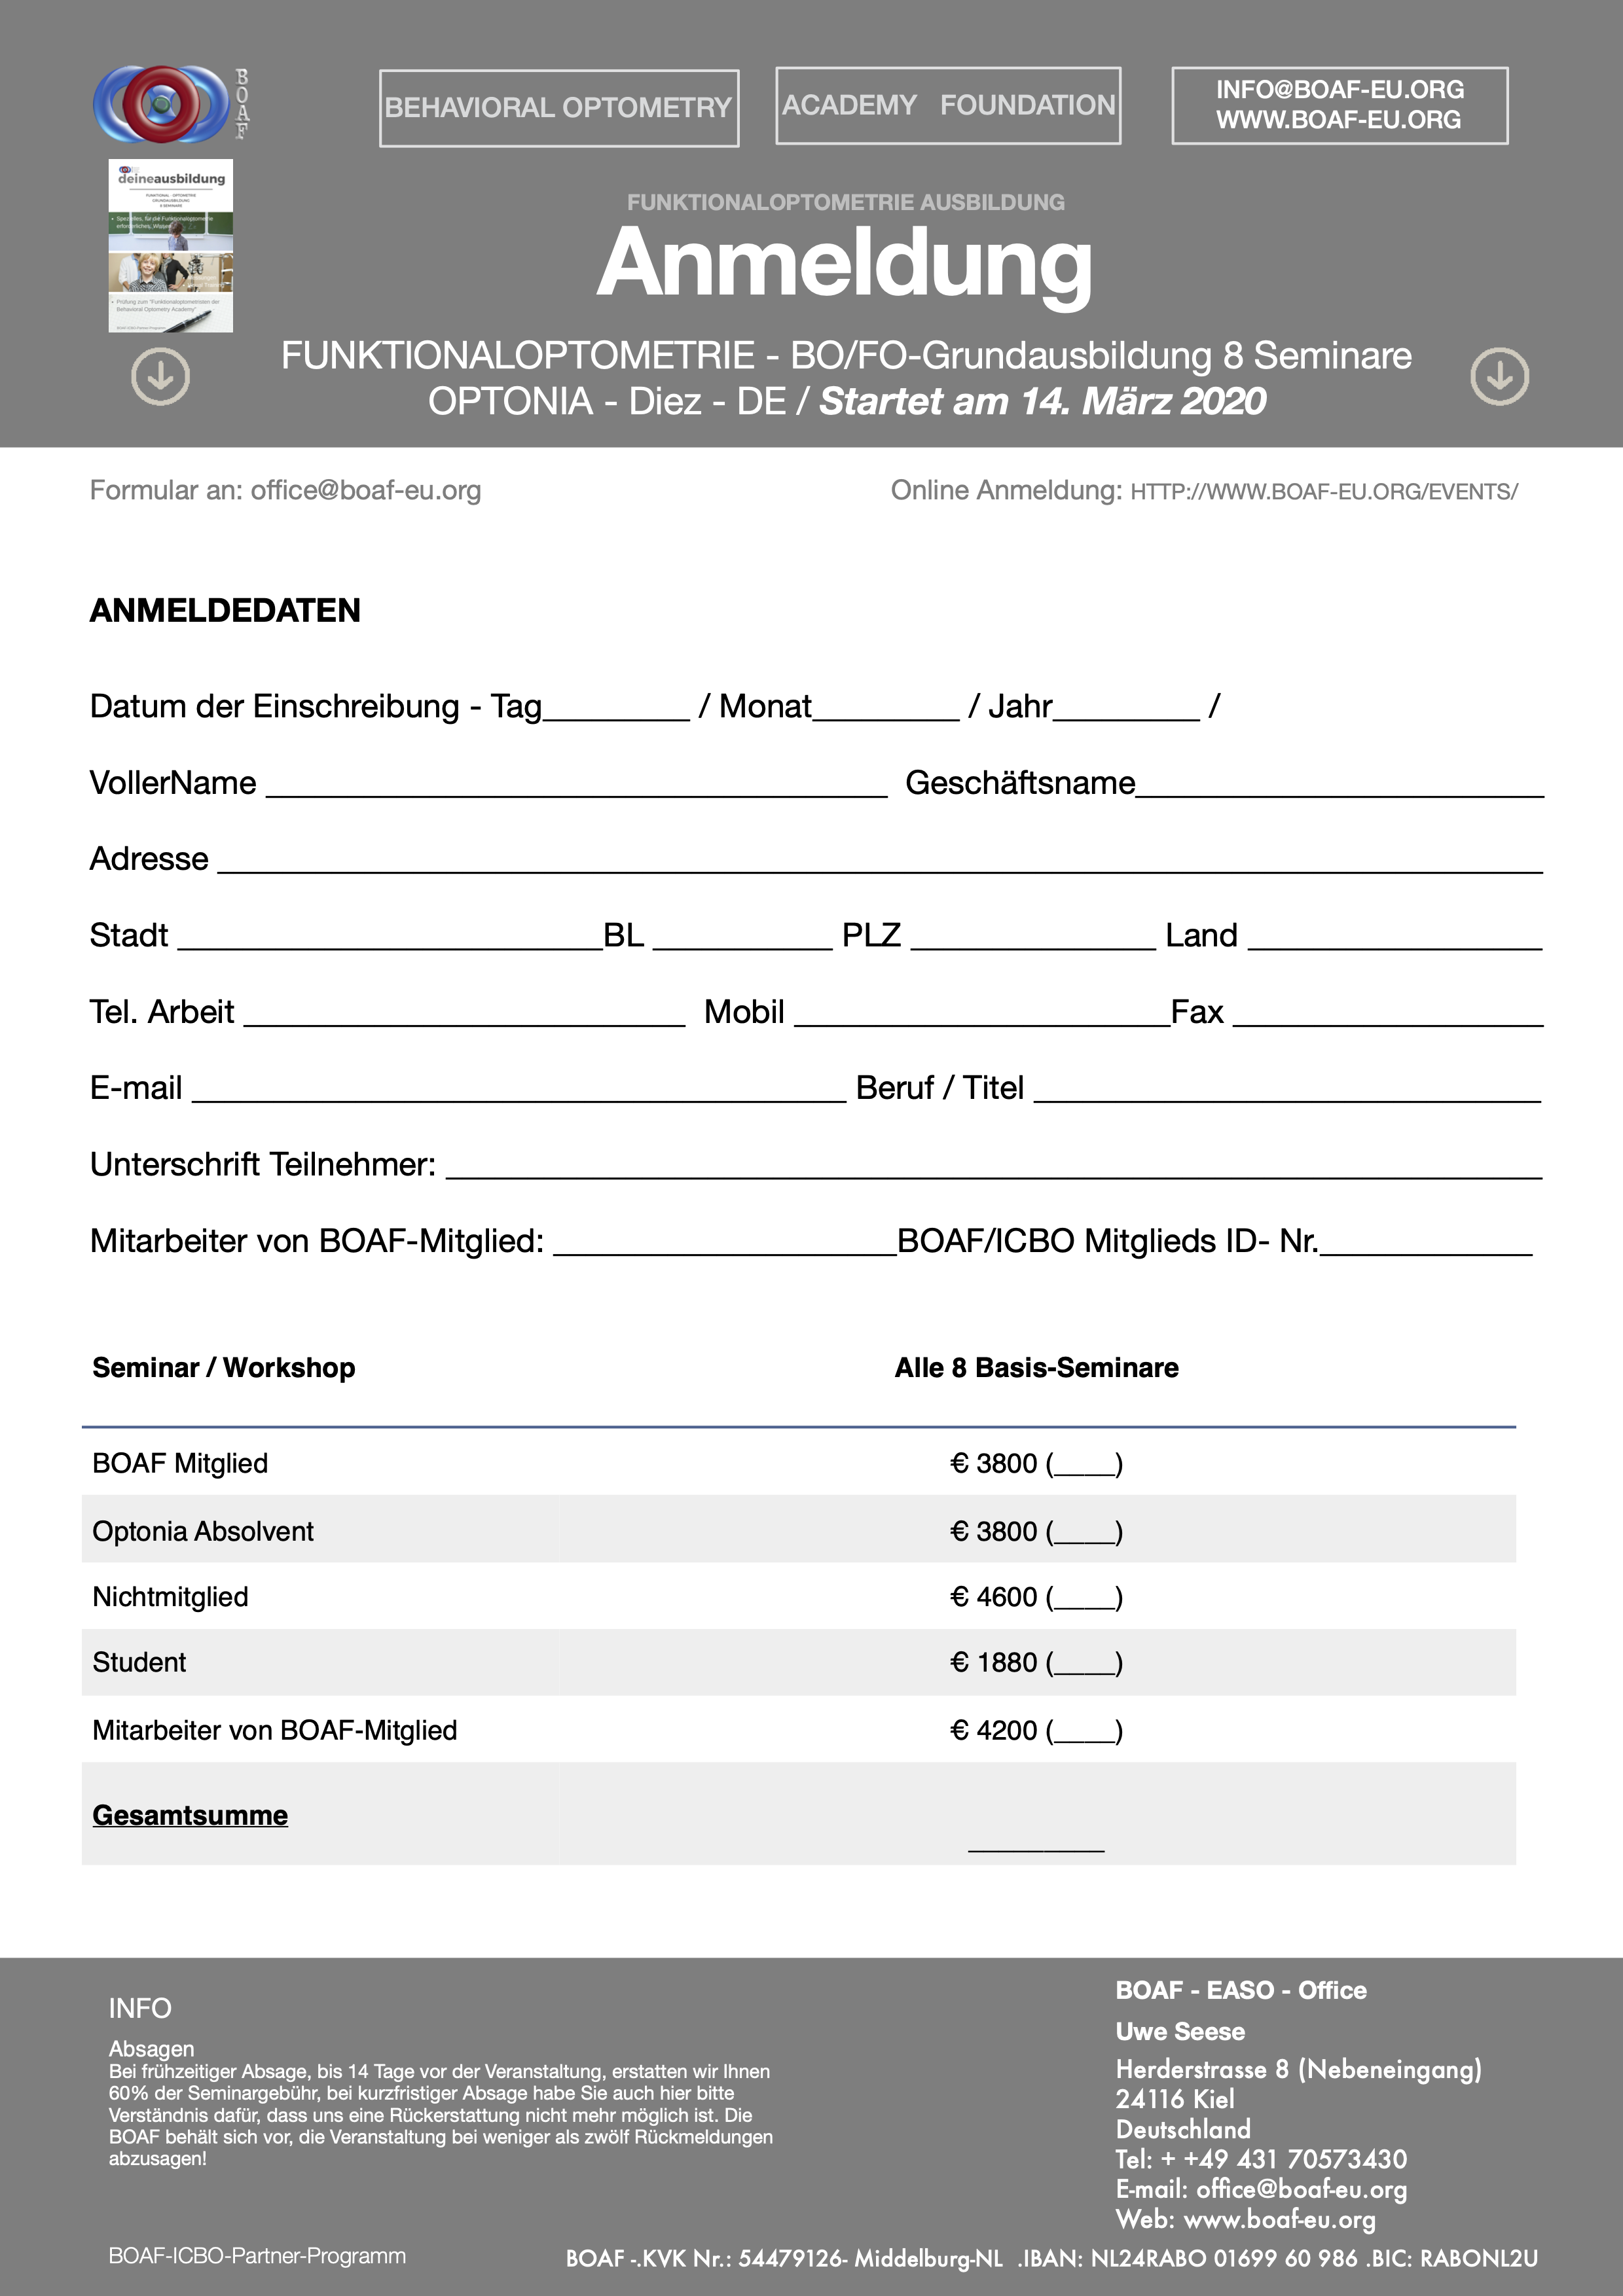 PDF Link  --->